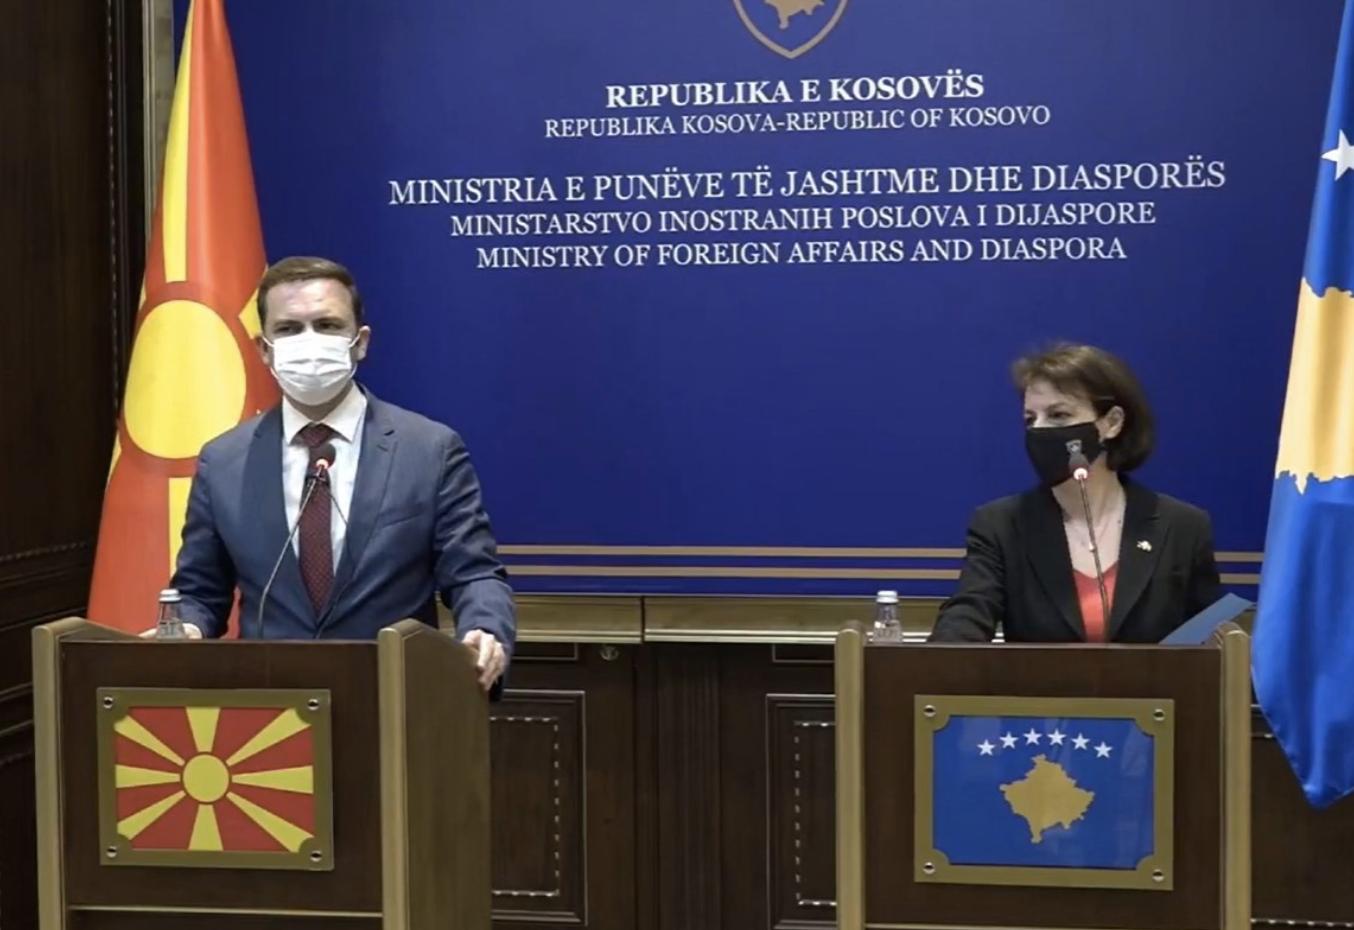 Osmani: Κοσσυφοπέδιο και Βόρεια Μακεδονία είναι ένα καλό παράδειγμα καλής γειτονίας